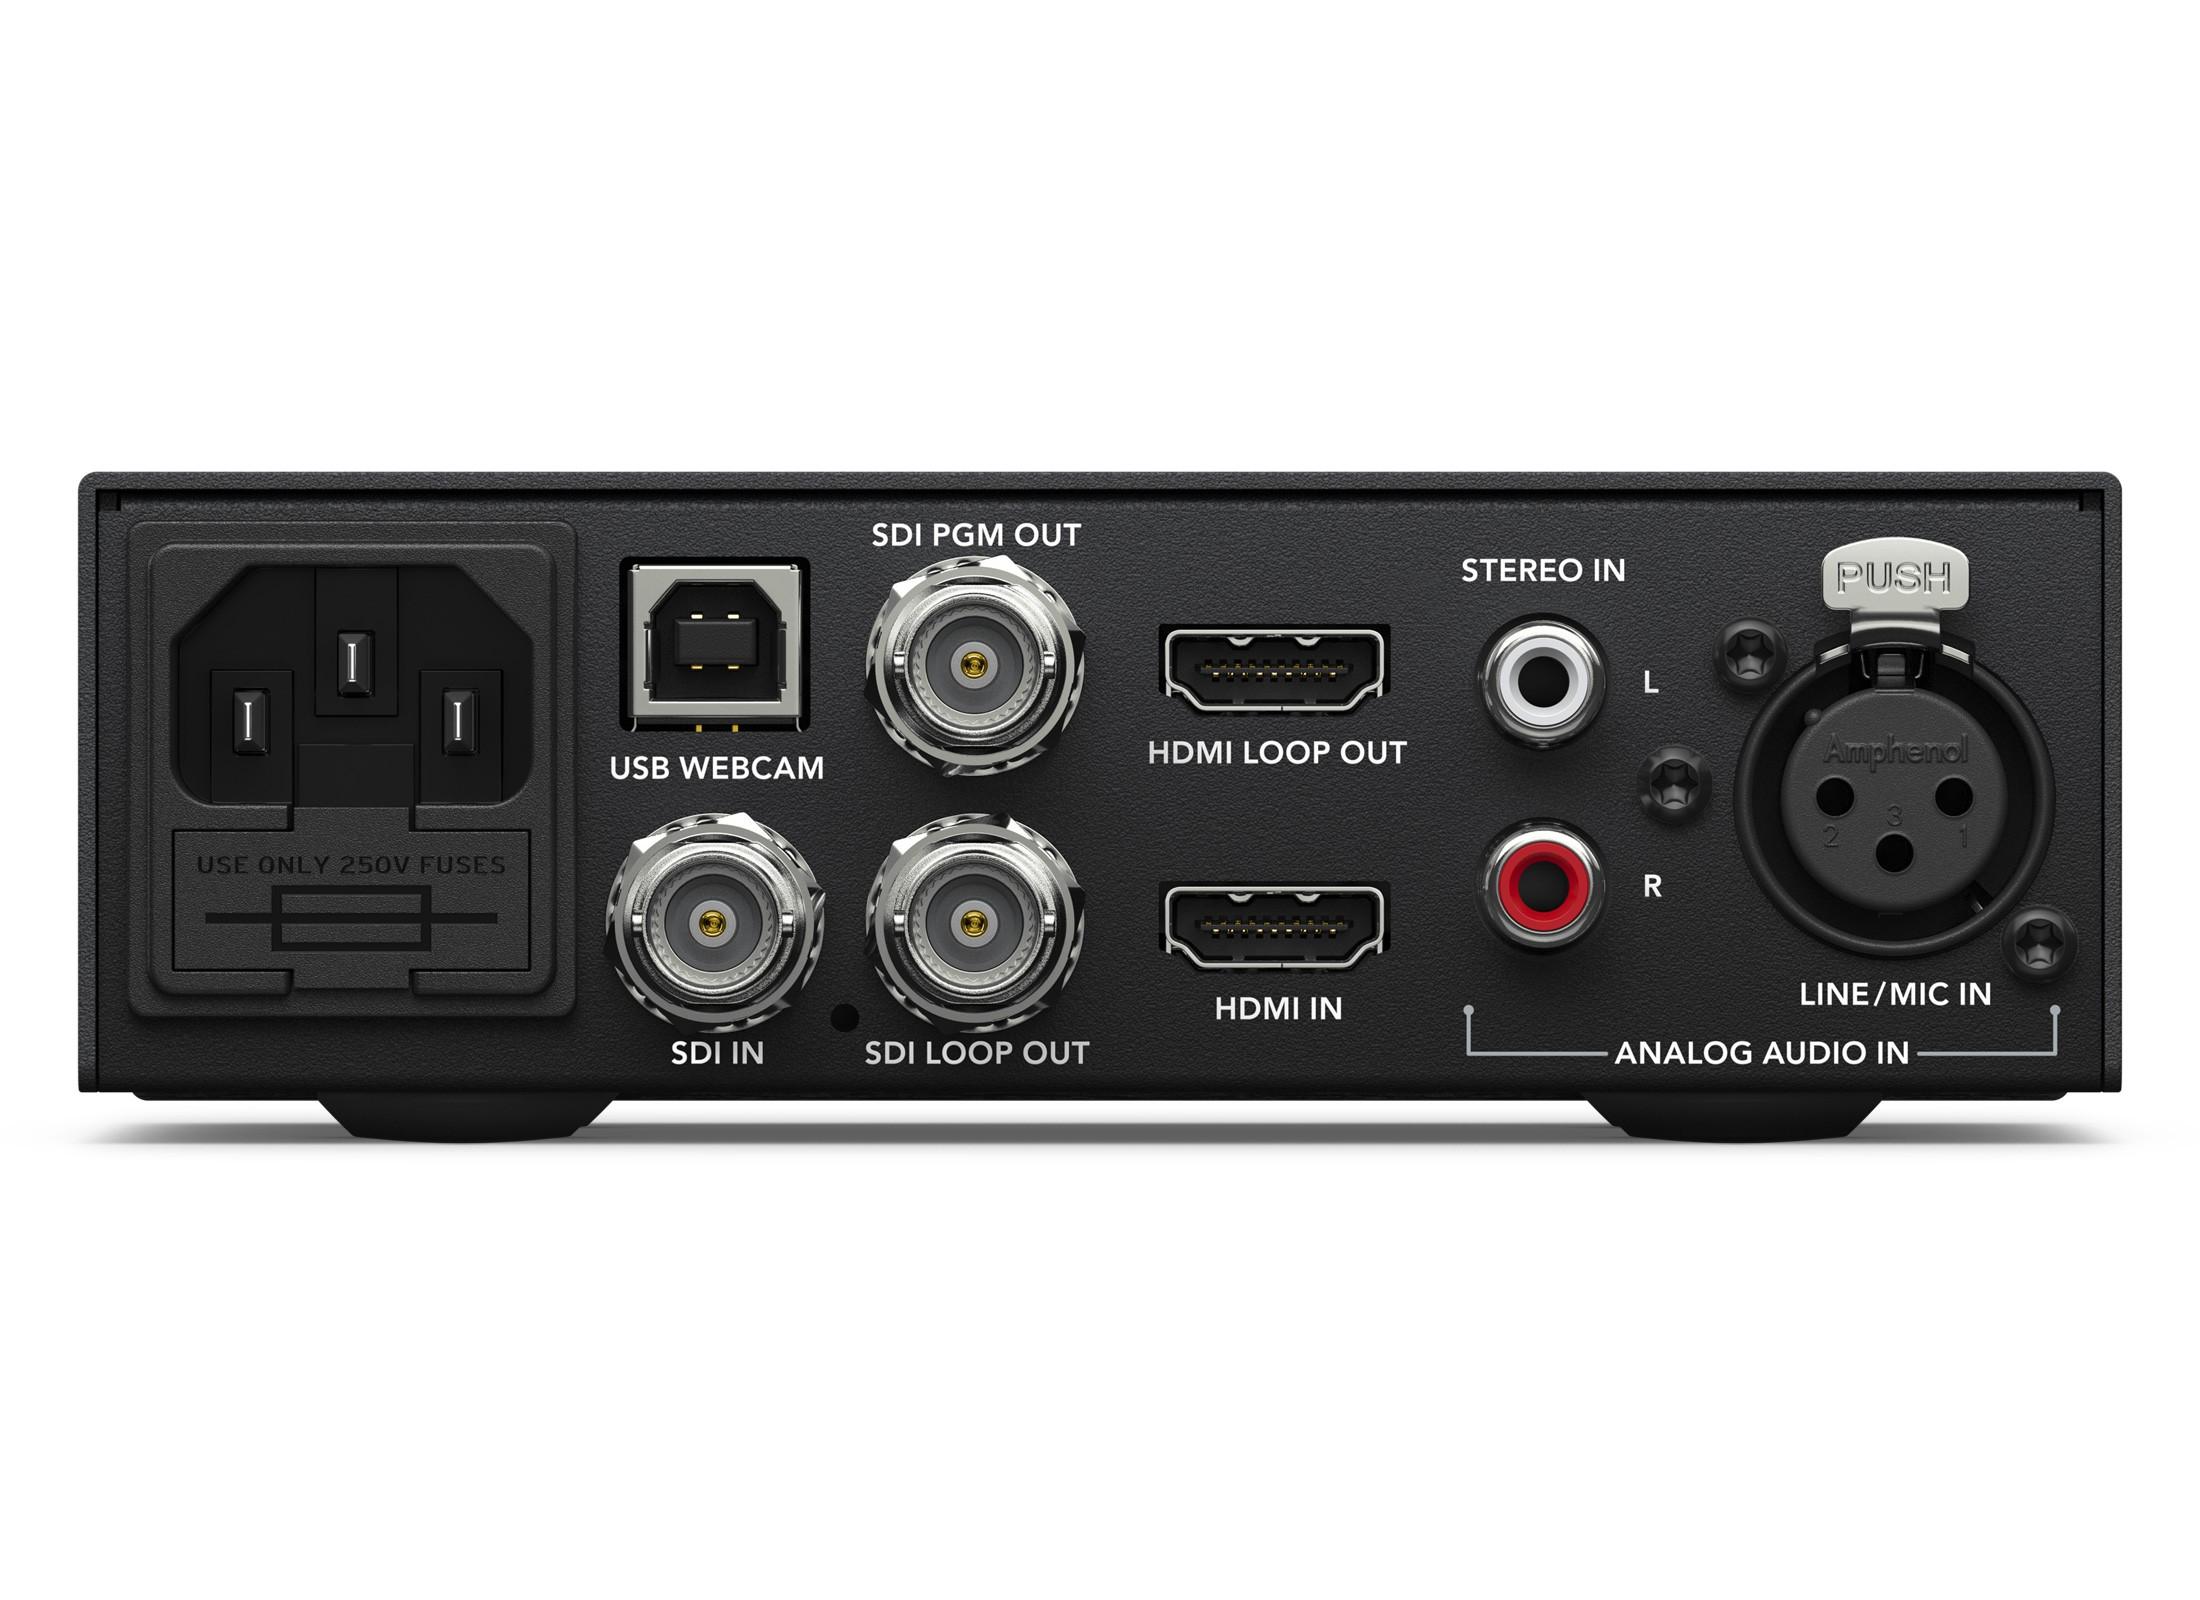 Blackmagic Design Web Presenter Streamer Online At Low Prices At Huss Light Sound